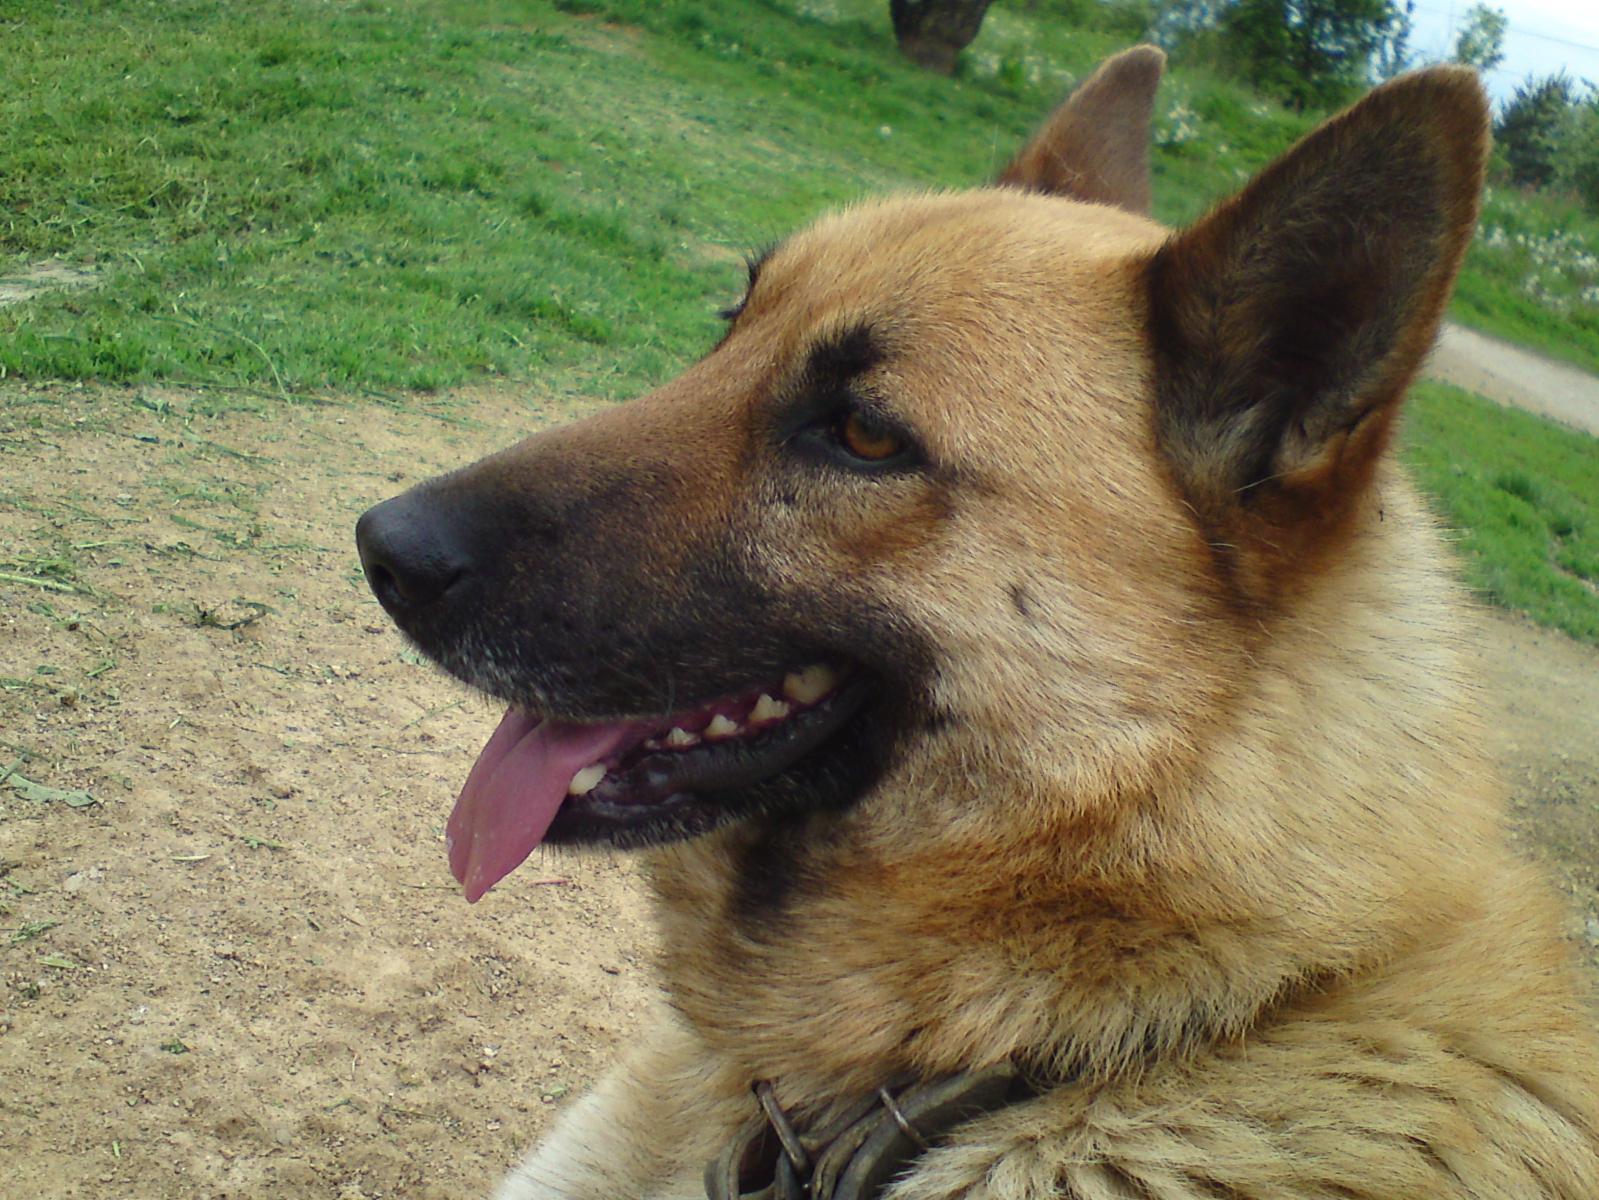 my friend Deny :) it is crazy Dog :D